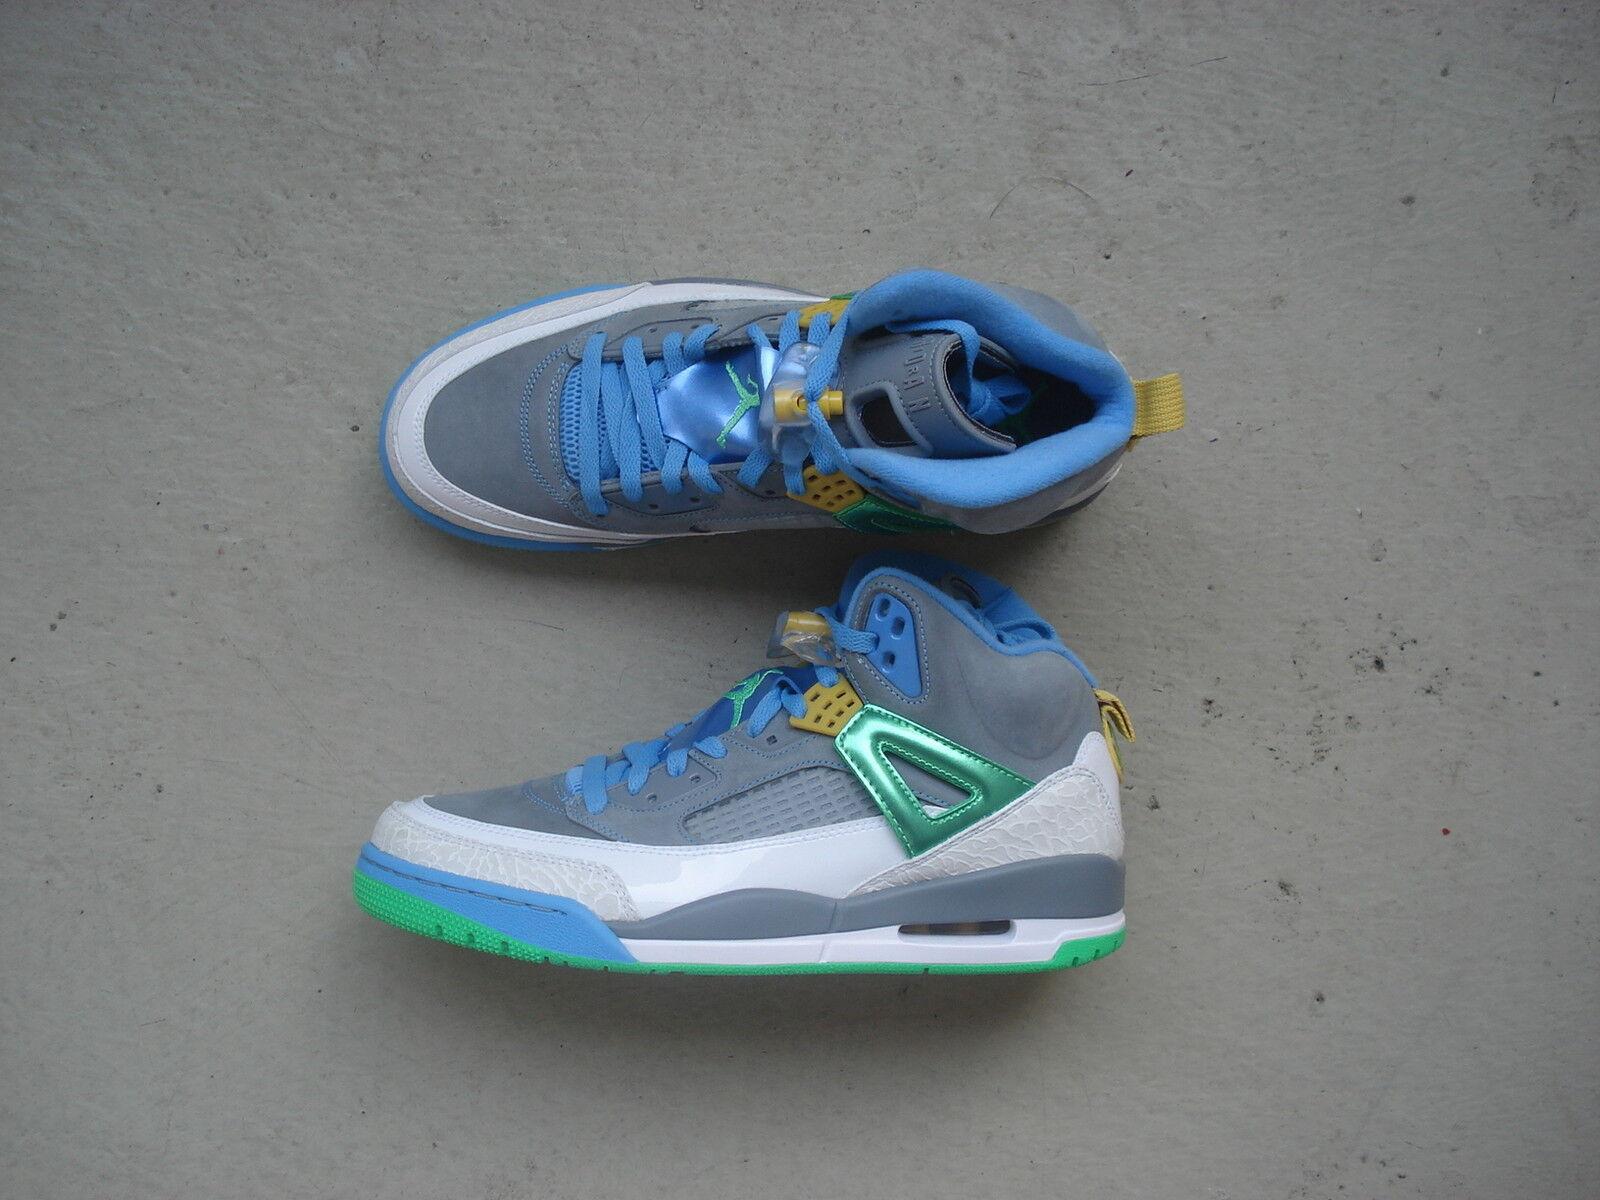 Nike Air Jordan Spiz'ike 45 Stealth/Poison Vert-University Bleu-Blitz Bleu